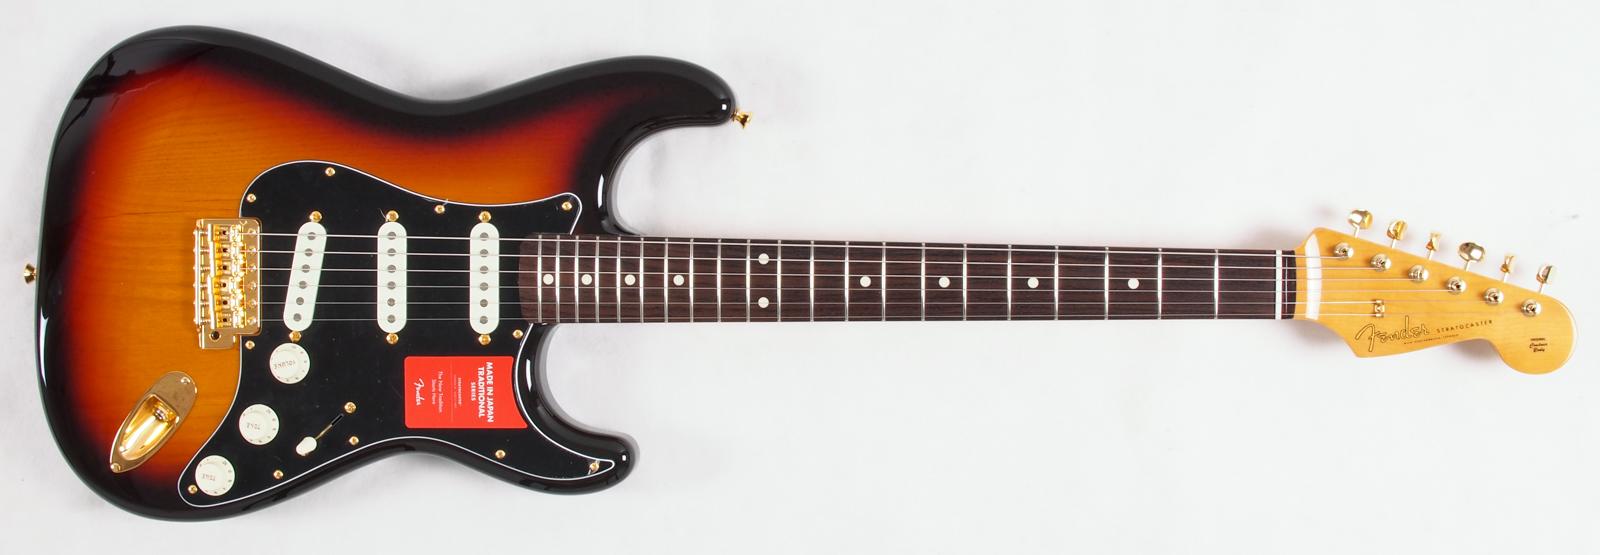 Fender FSR Japan Classic 60's Strat with Gold Hardware 3 Tone Sunburst